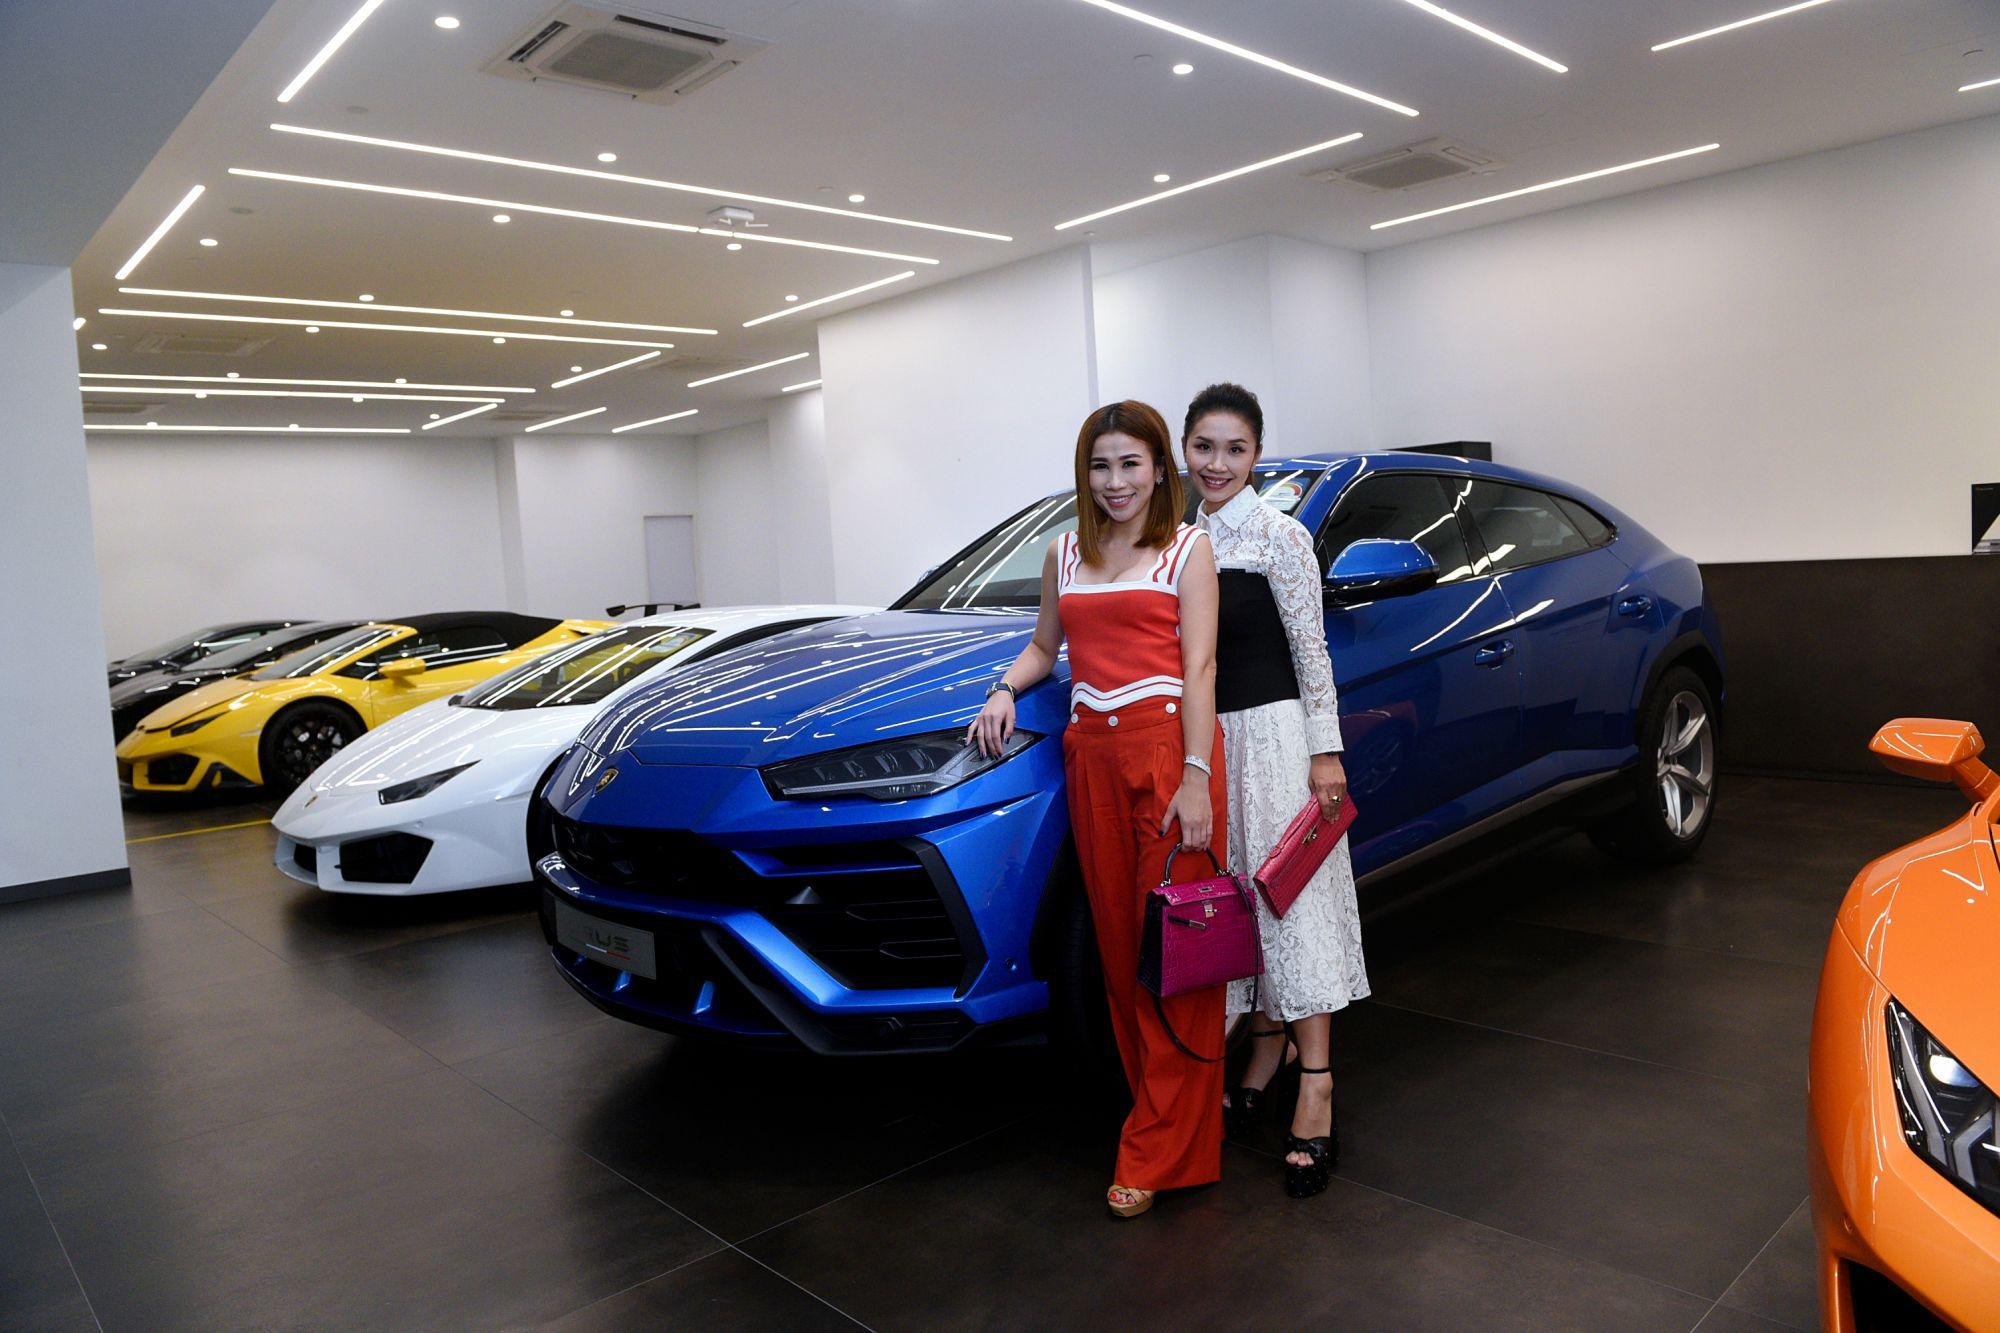 Sammi Lim, Jacqueline Wang